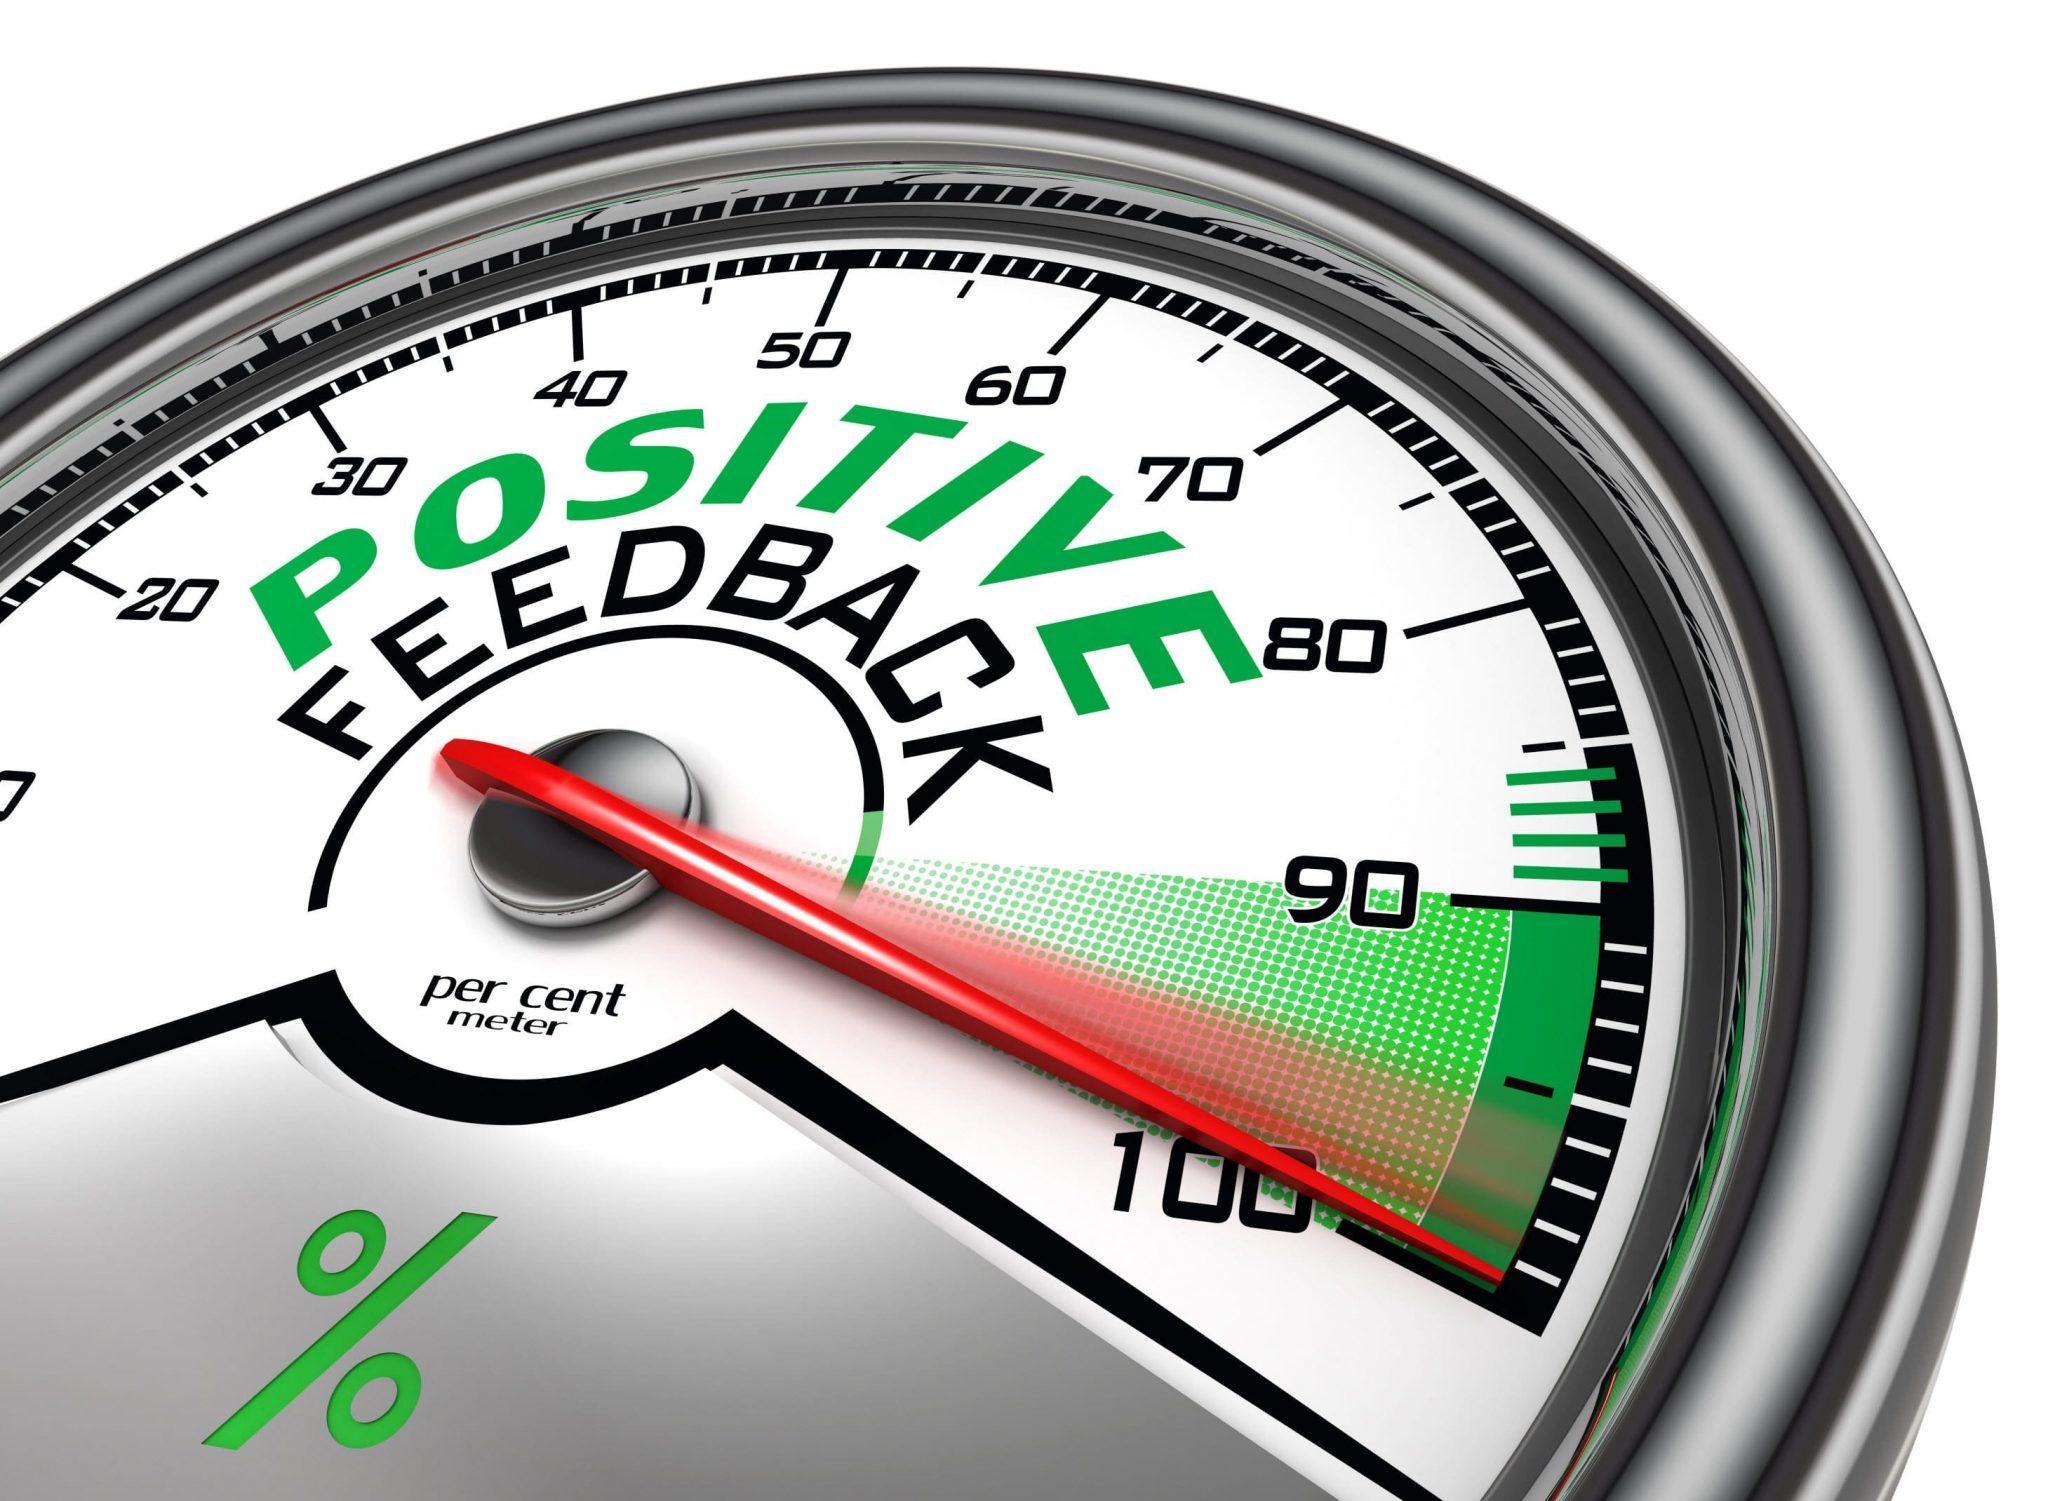 360 degree appraisal method pdf